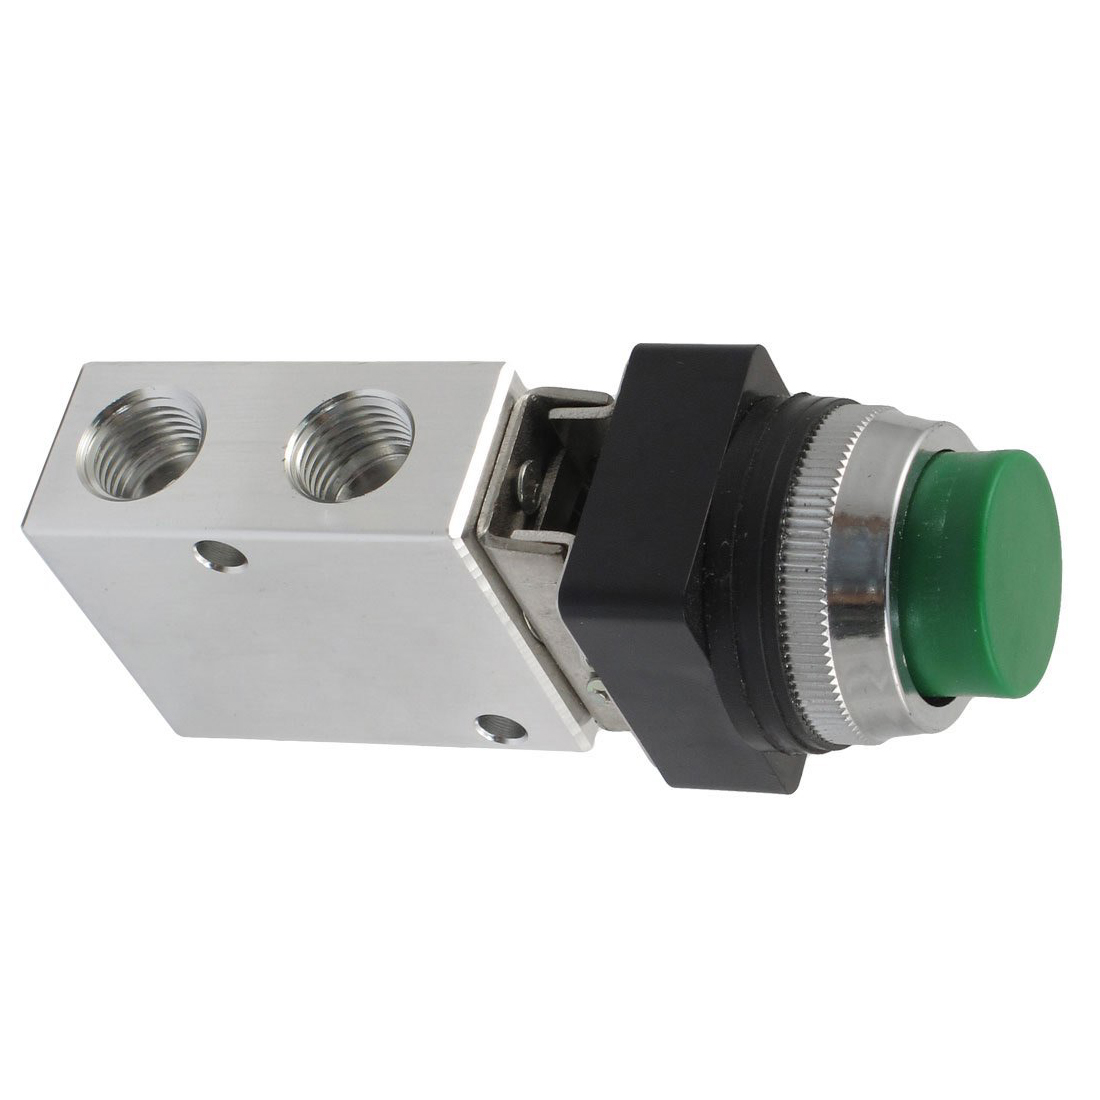 High Quality JM-322PPL 13mm Thread 2 Position 3 Way Green Push Button Air Mechanical Valve